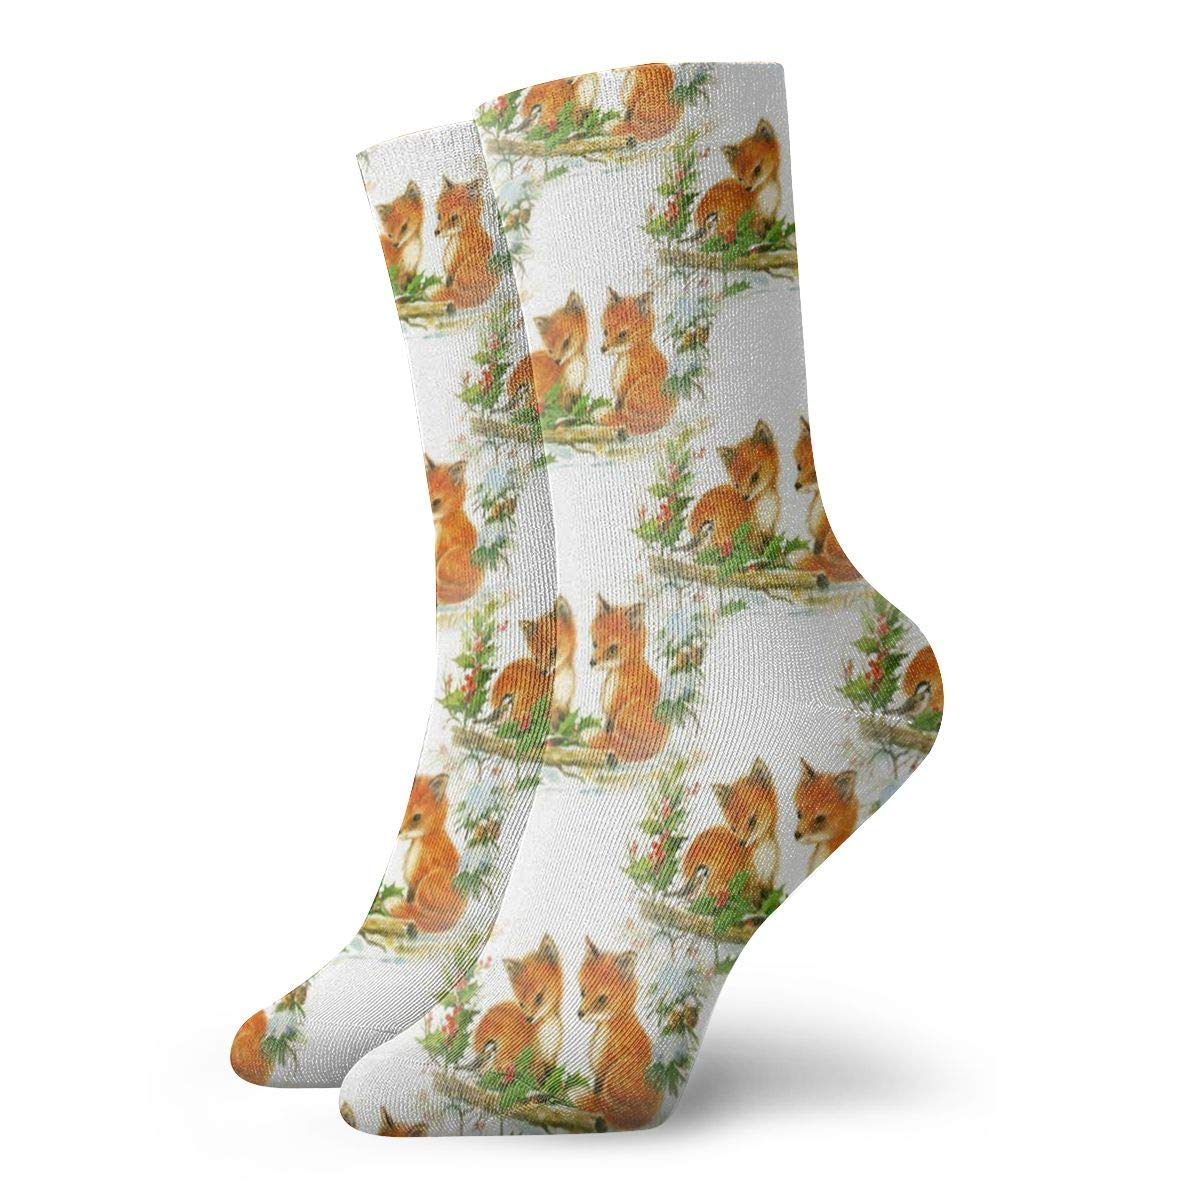 Fox Babies Vintage Christmas Men Women Novelty Funny Crazy Crew Sock Printed Sport Athletic Socks 30cm Long Personalized Gift Socks